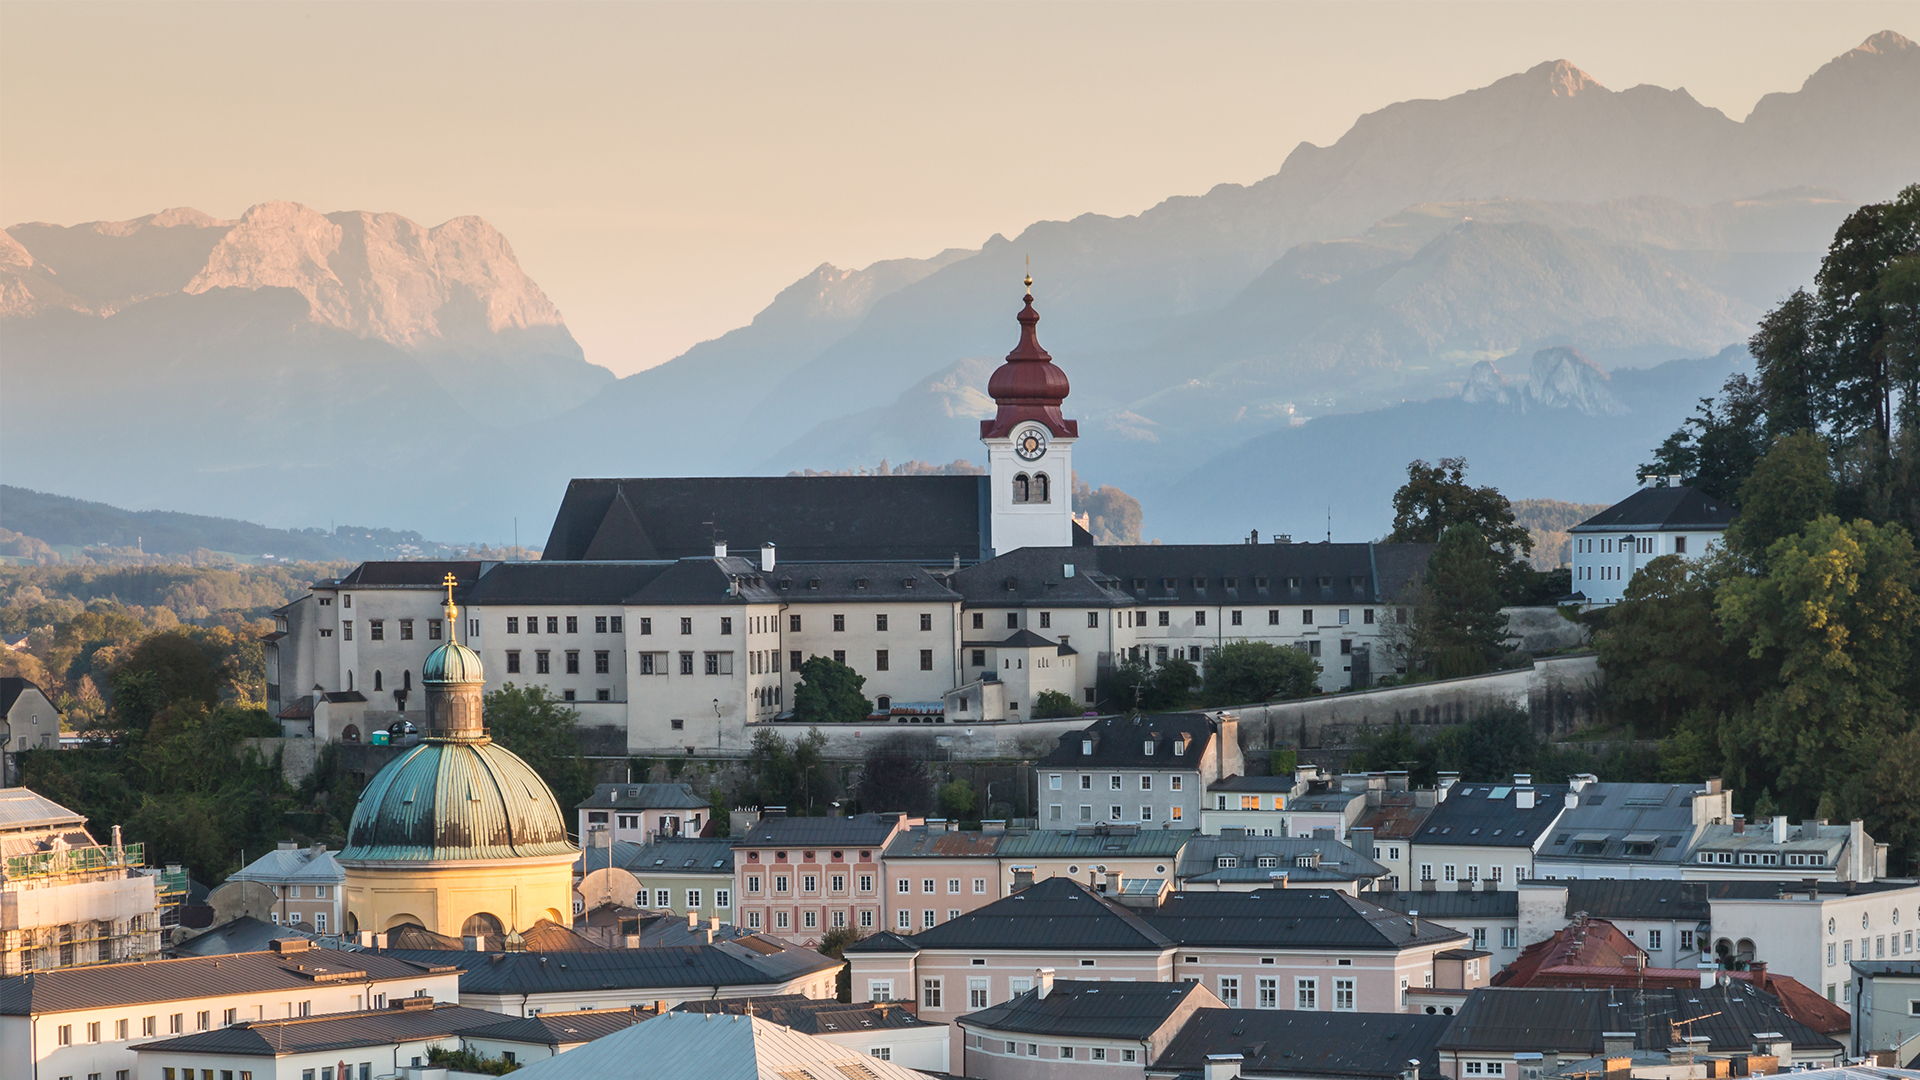 Salzburg-Nonnberg-Alps